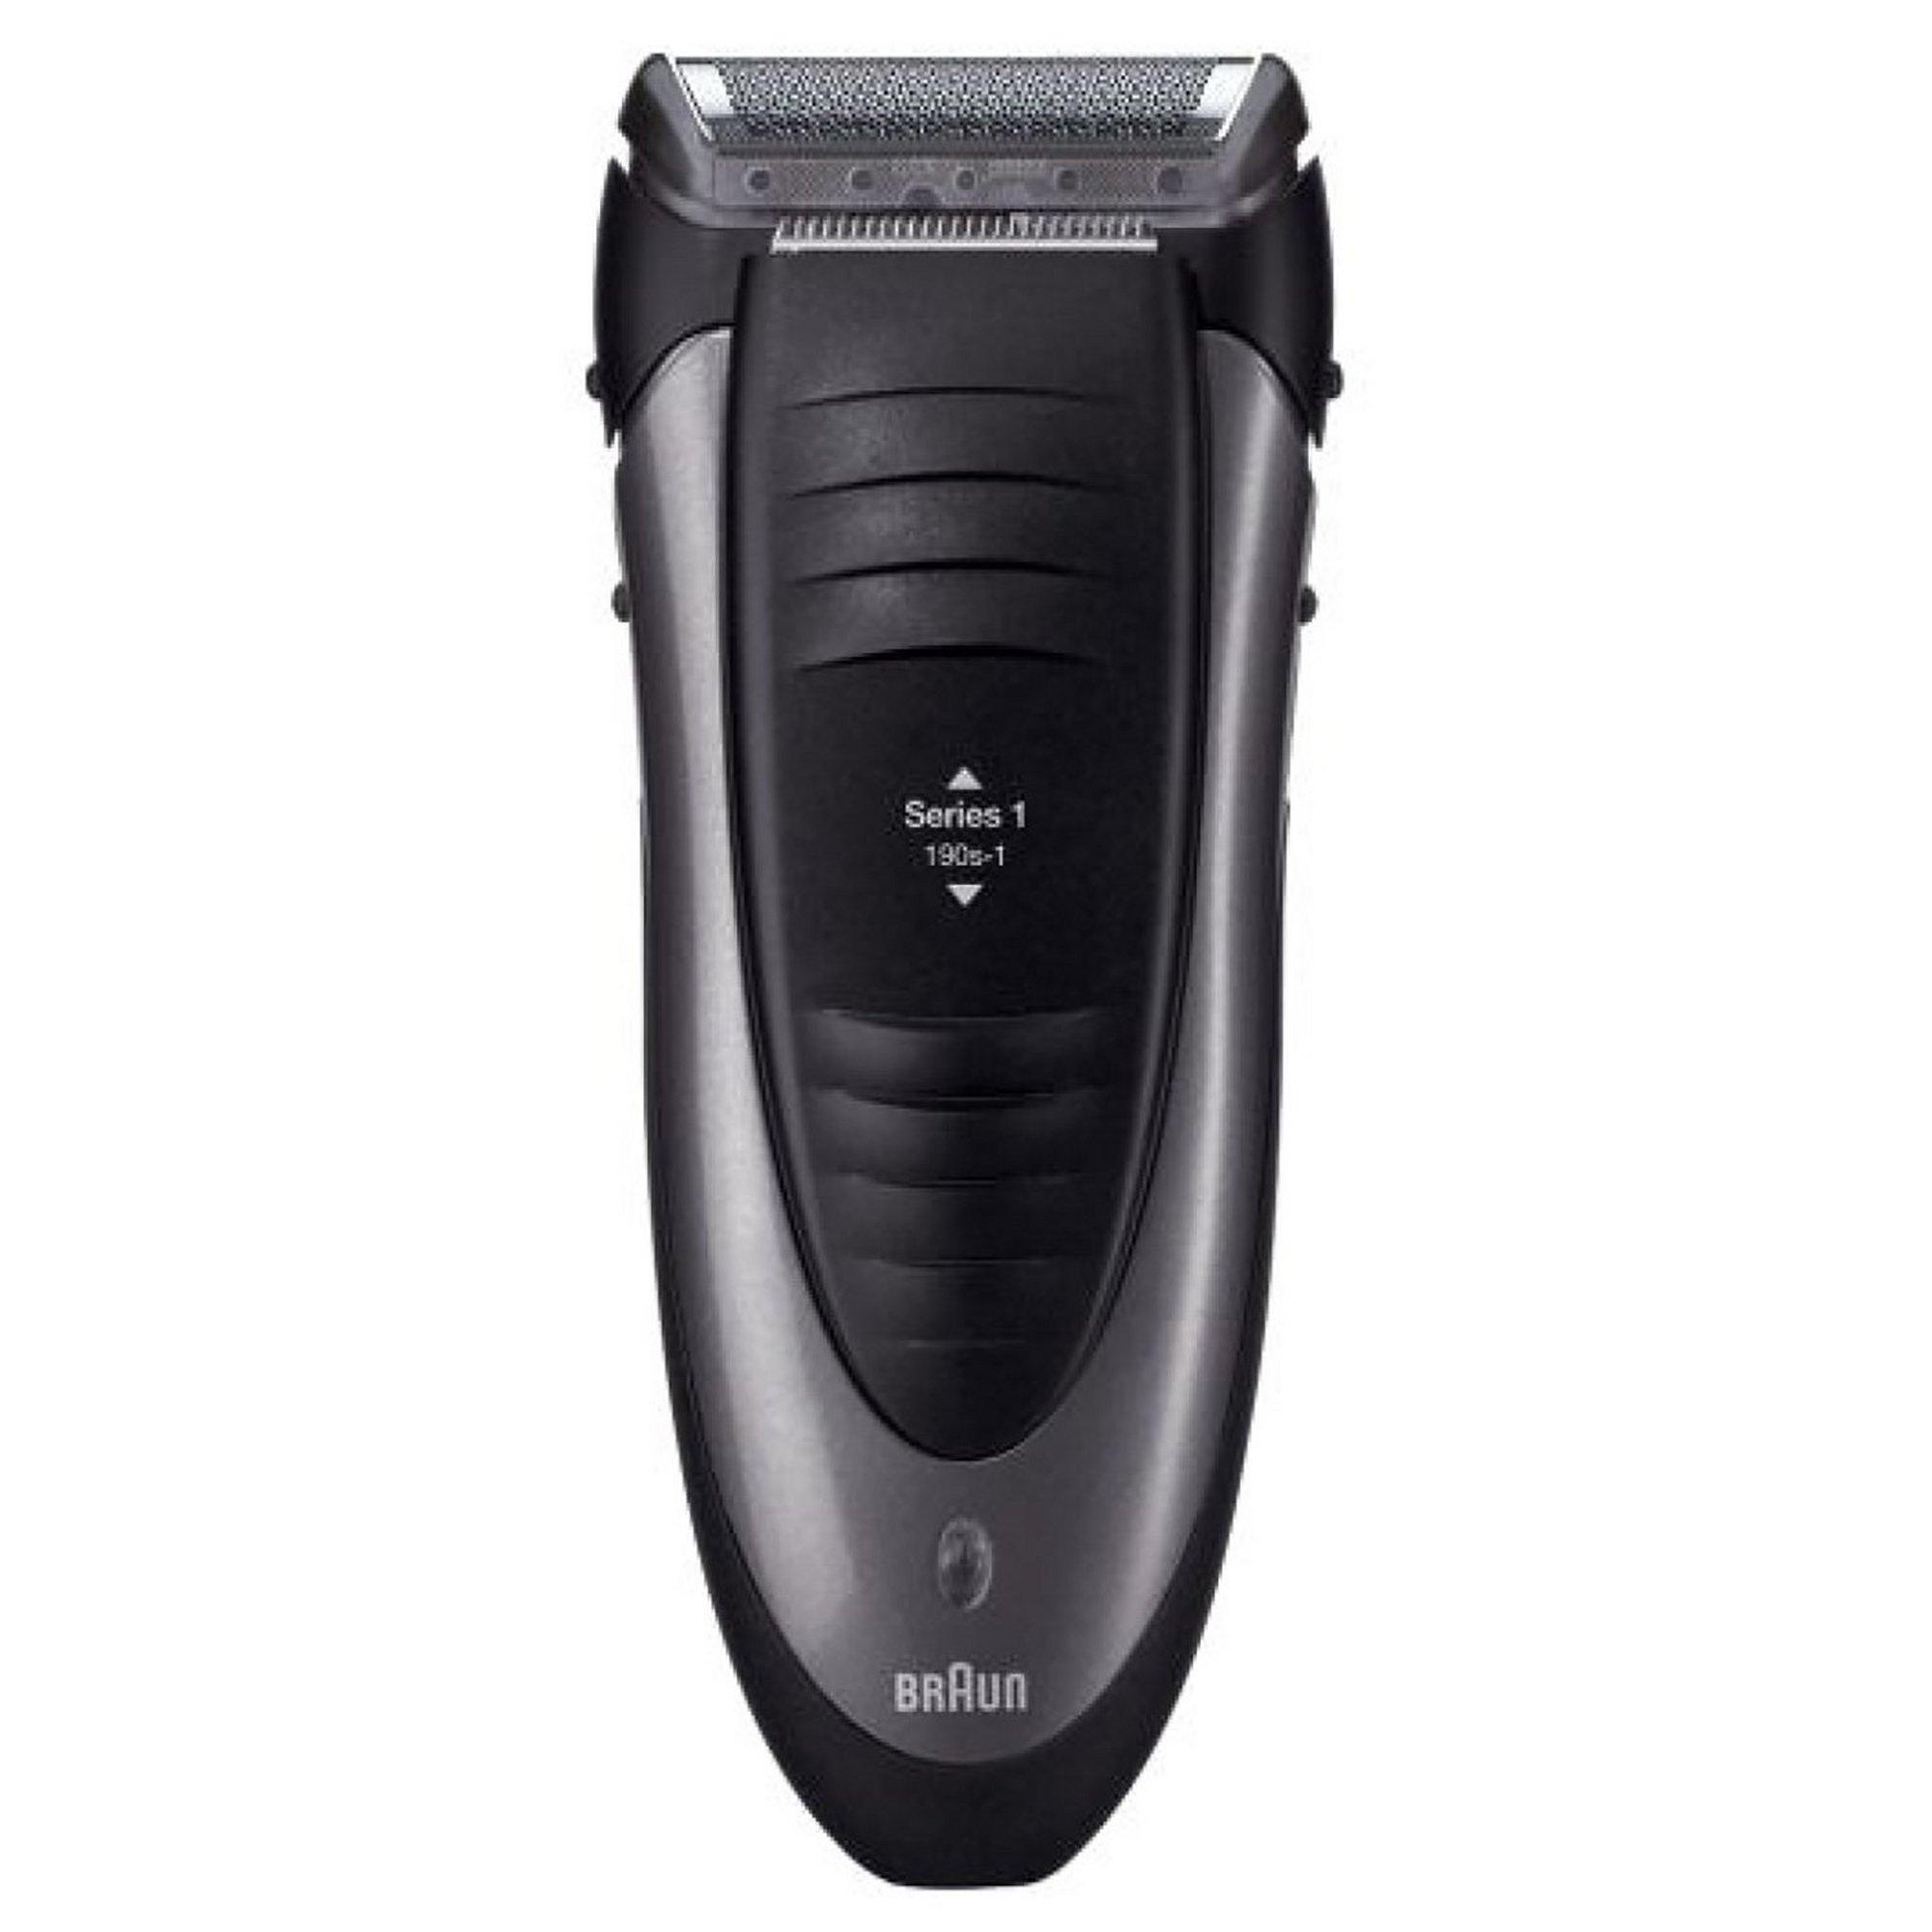 Image of Braun 190S Series 1 Mains Shaver